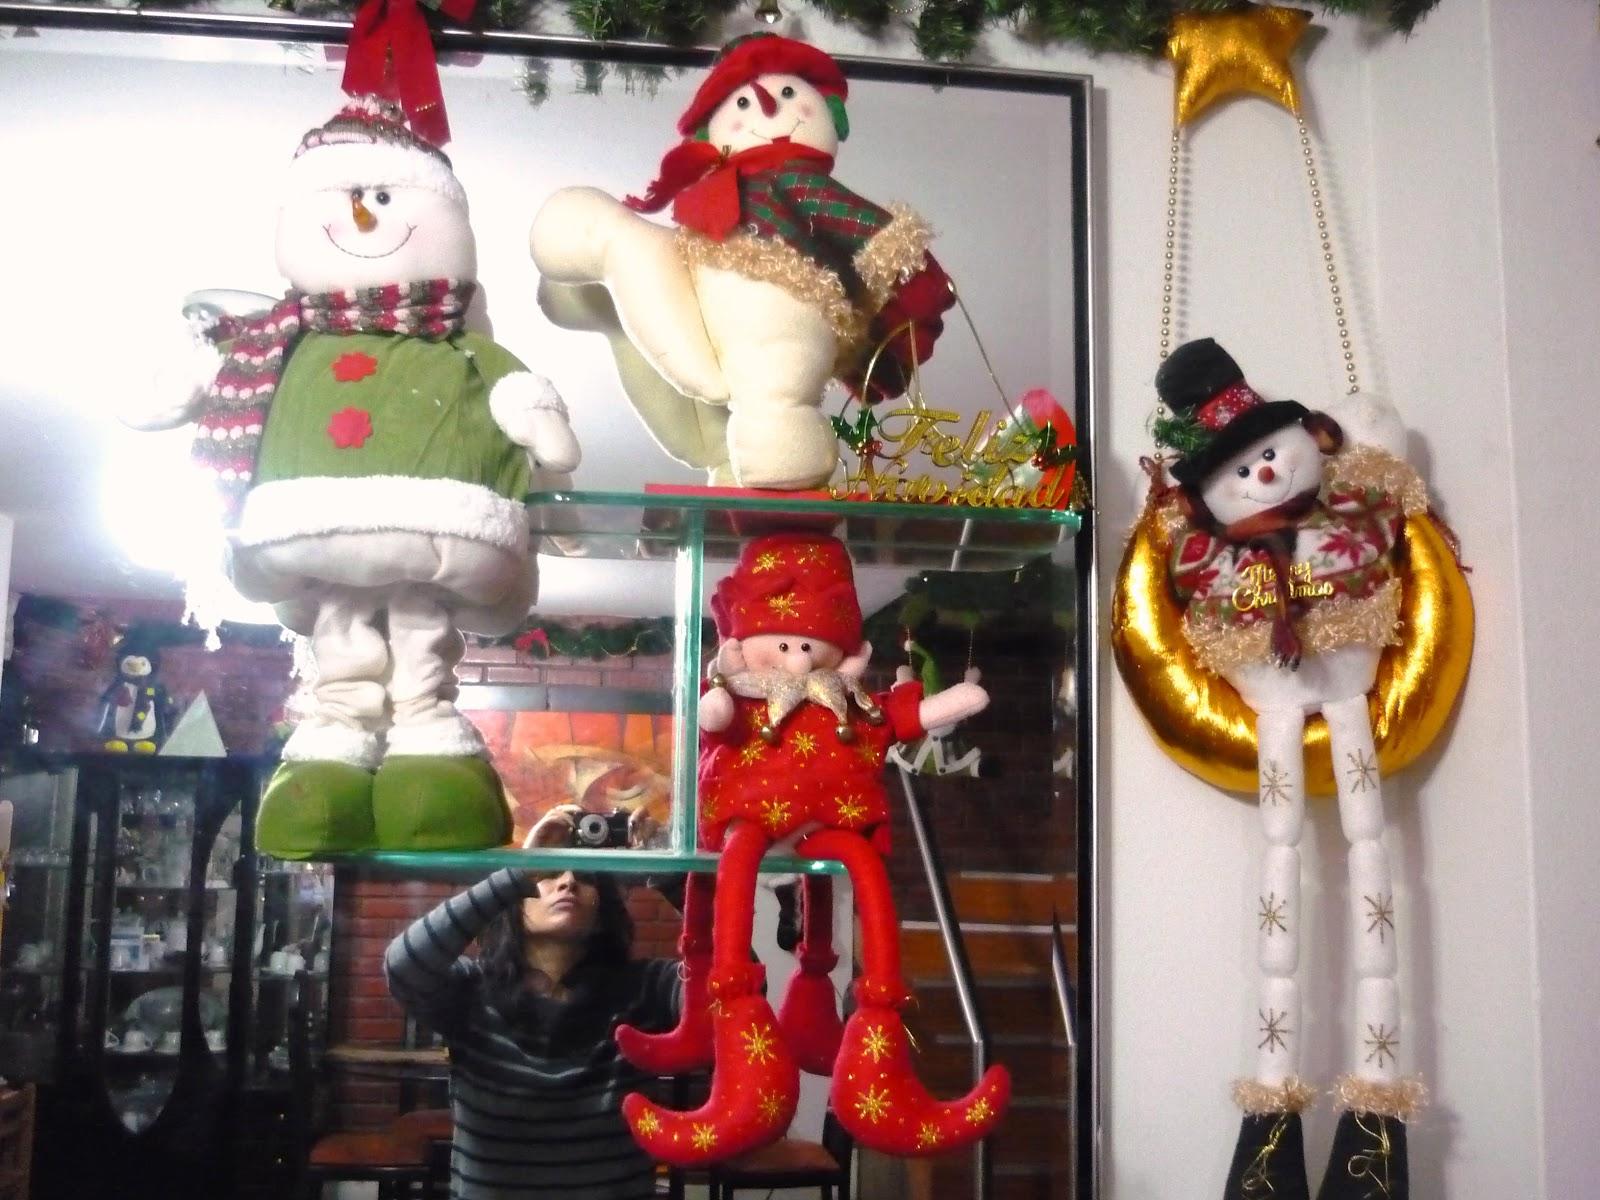 renzo misari manualidades navide as On trabajos manuales navideños